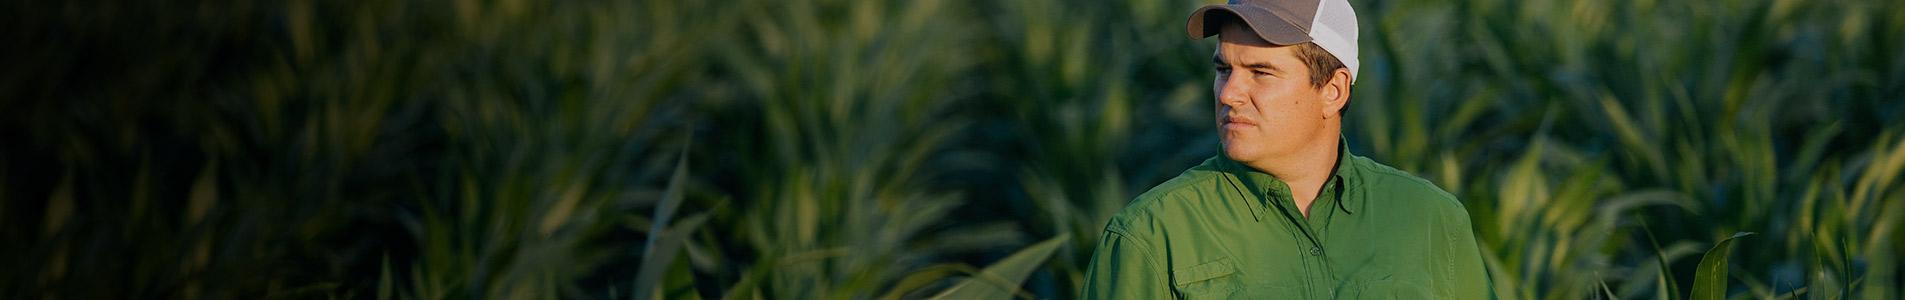 agsense grower testimonials